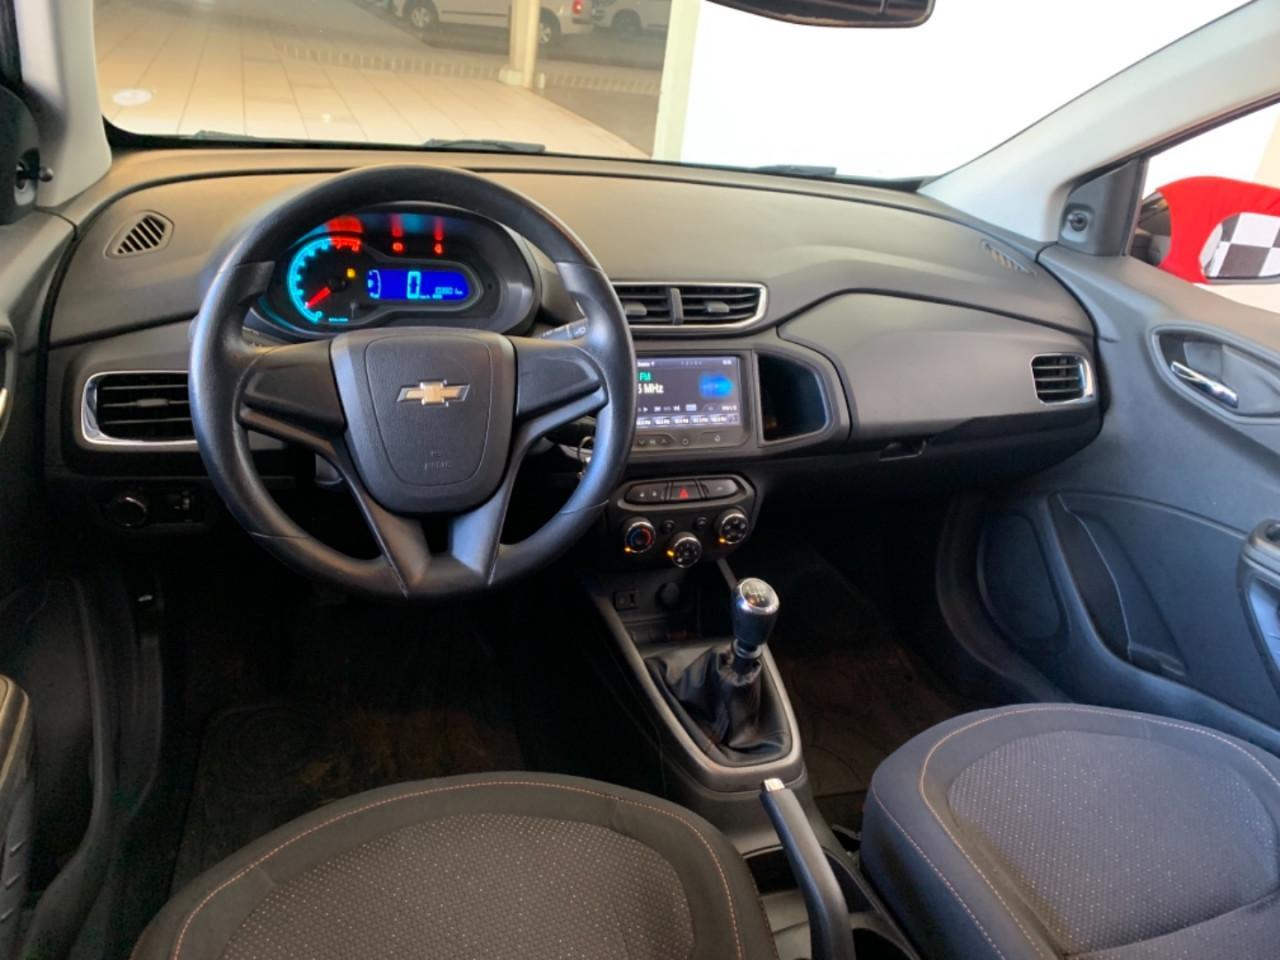 CHEVROLET Onix Hatch 1.4 4P FLEX LT, Foto 9